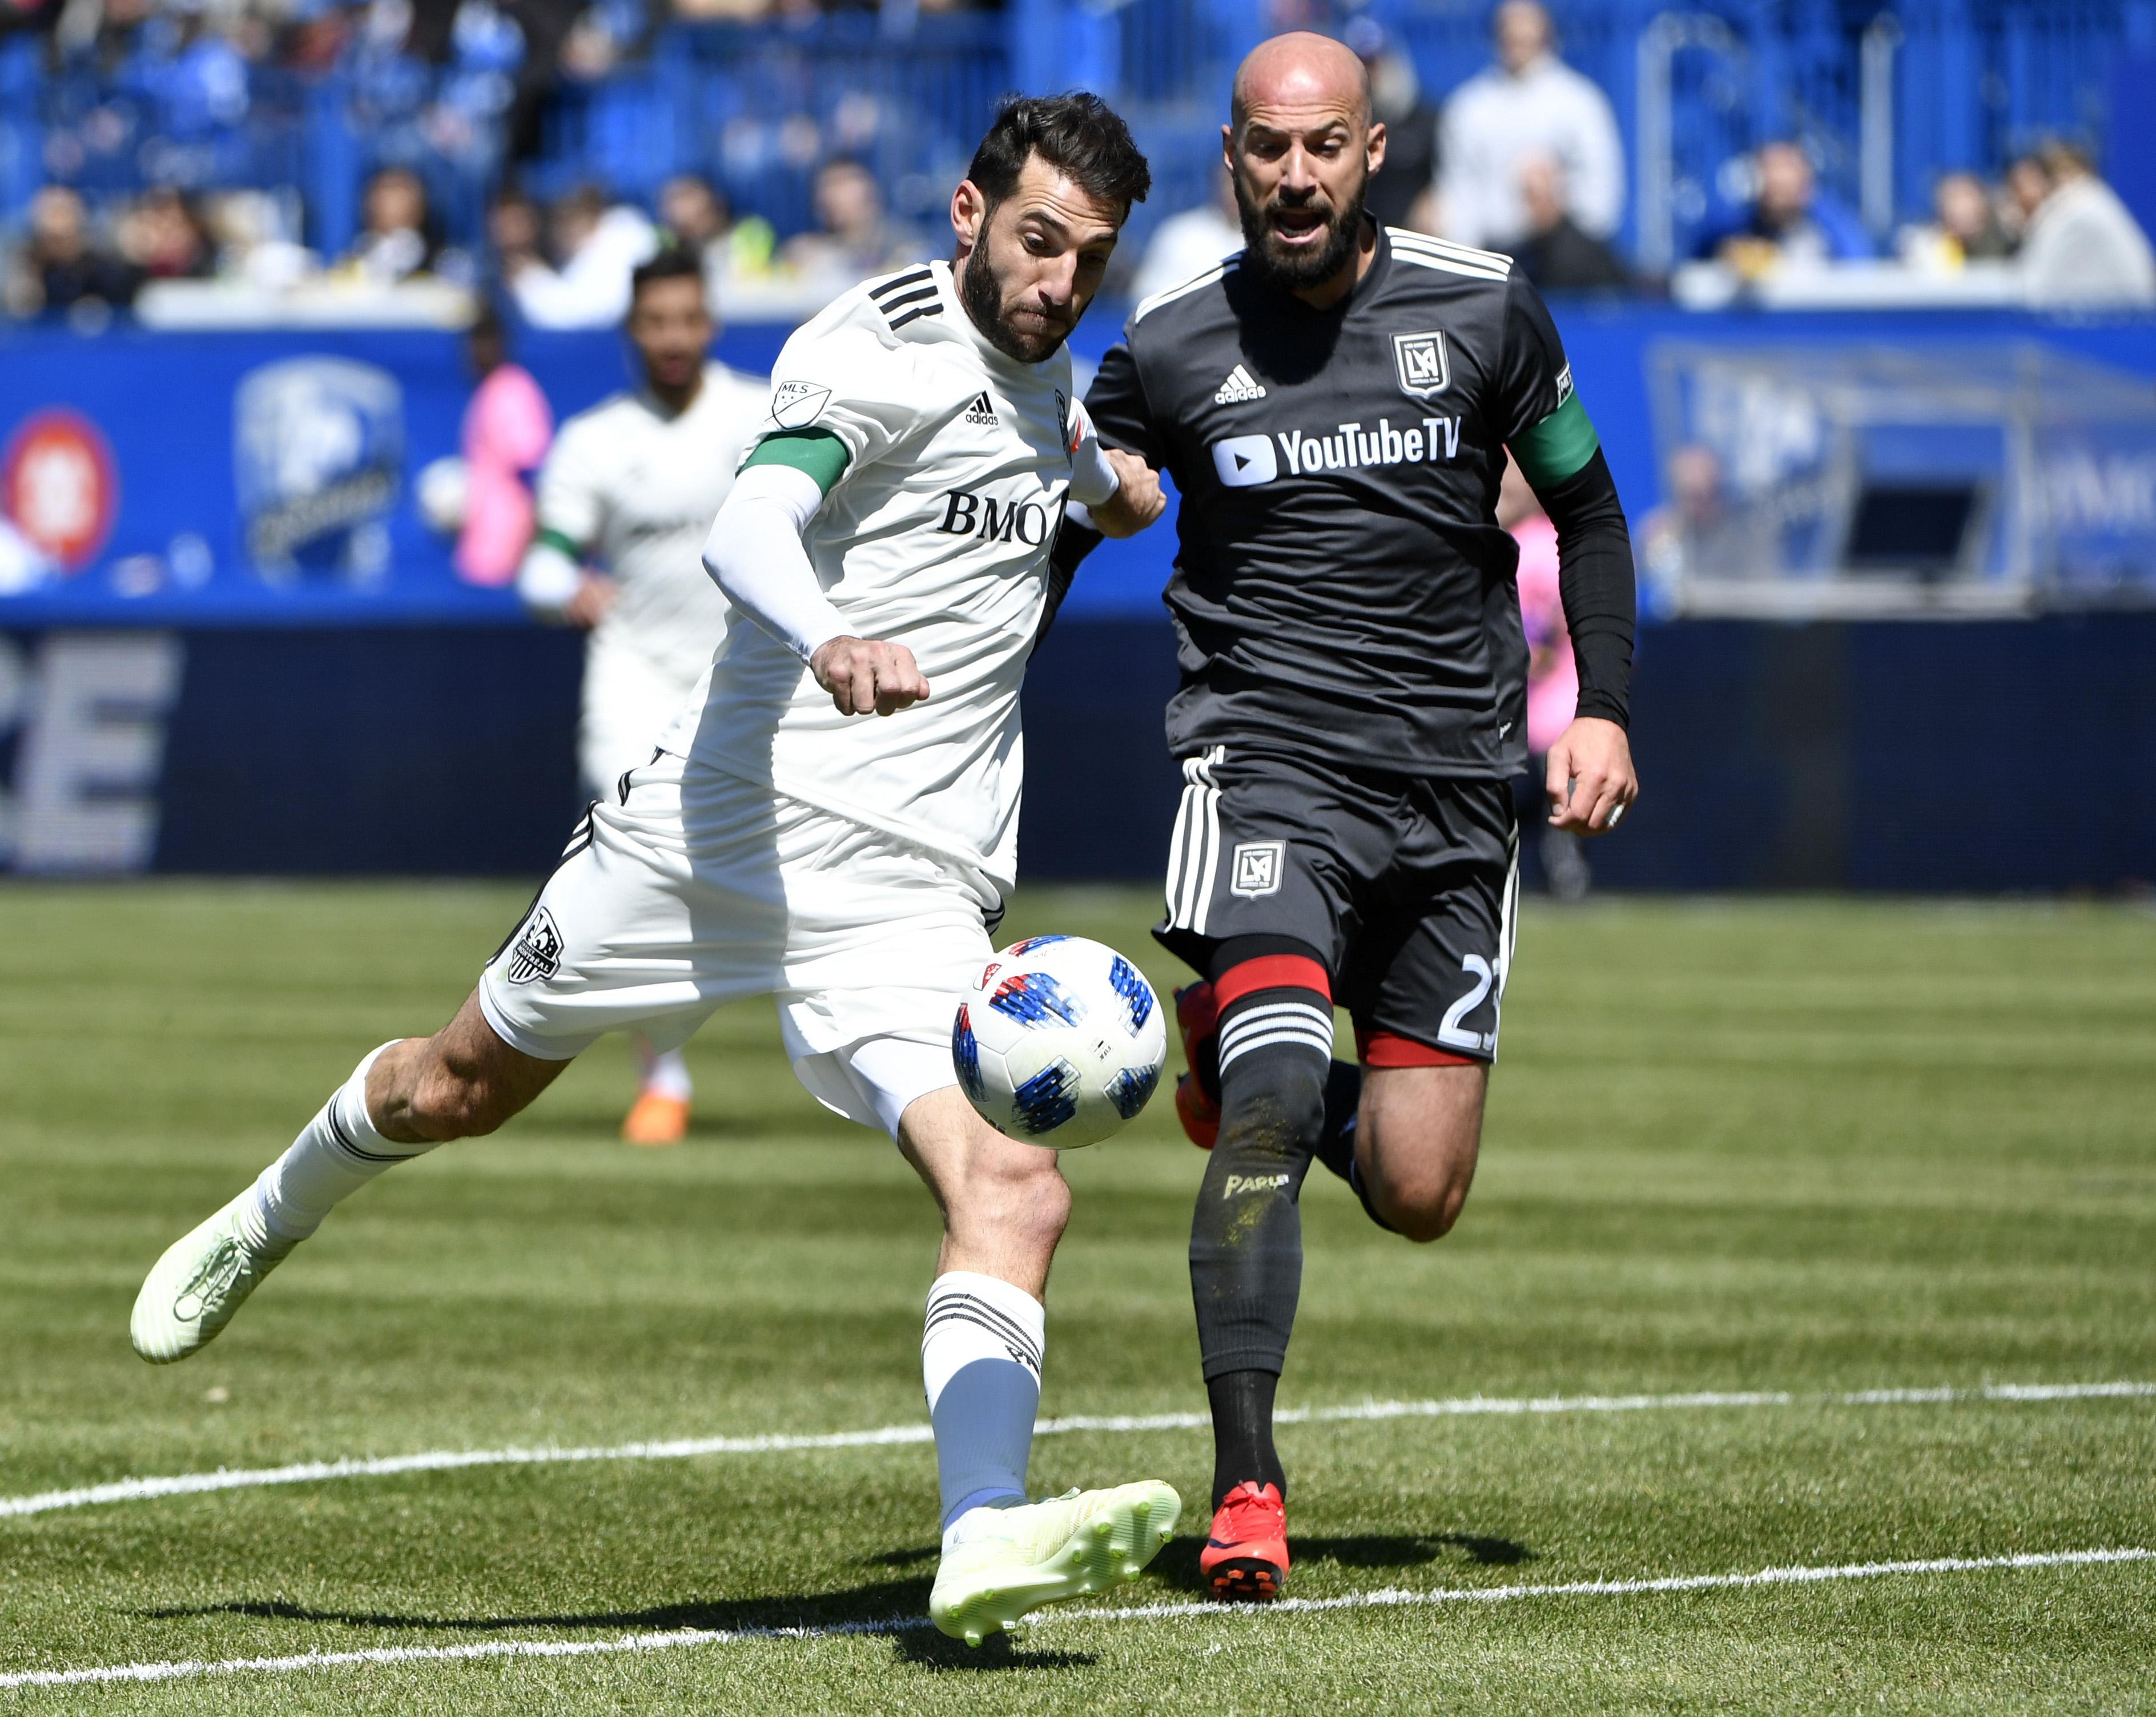 Jado S Virtuosos Lafc Pull An La Galaxy And Get The Comeback Win Mount Royal Soccer